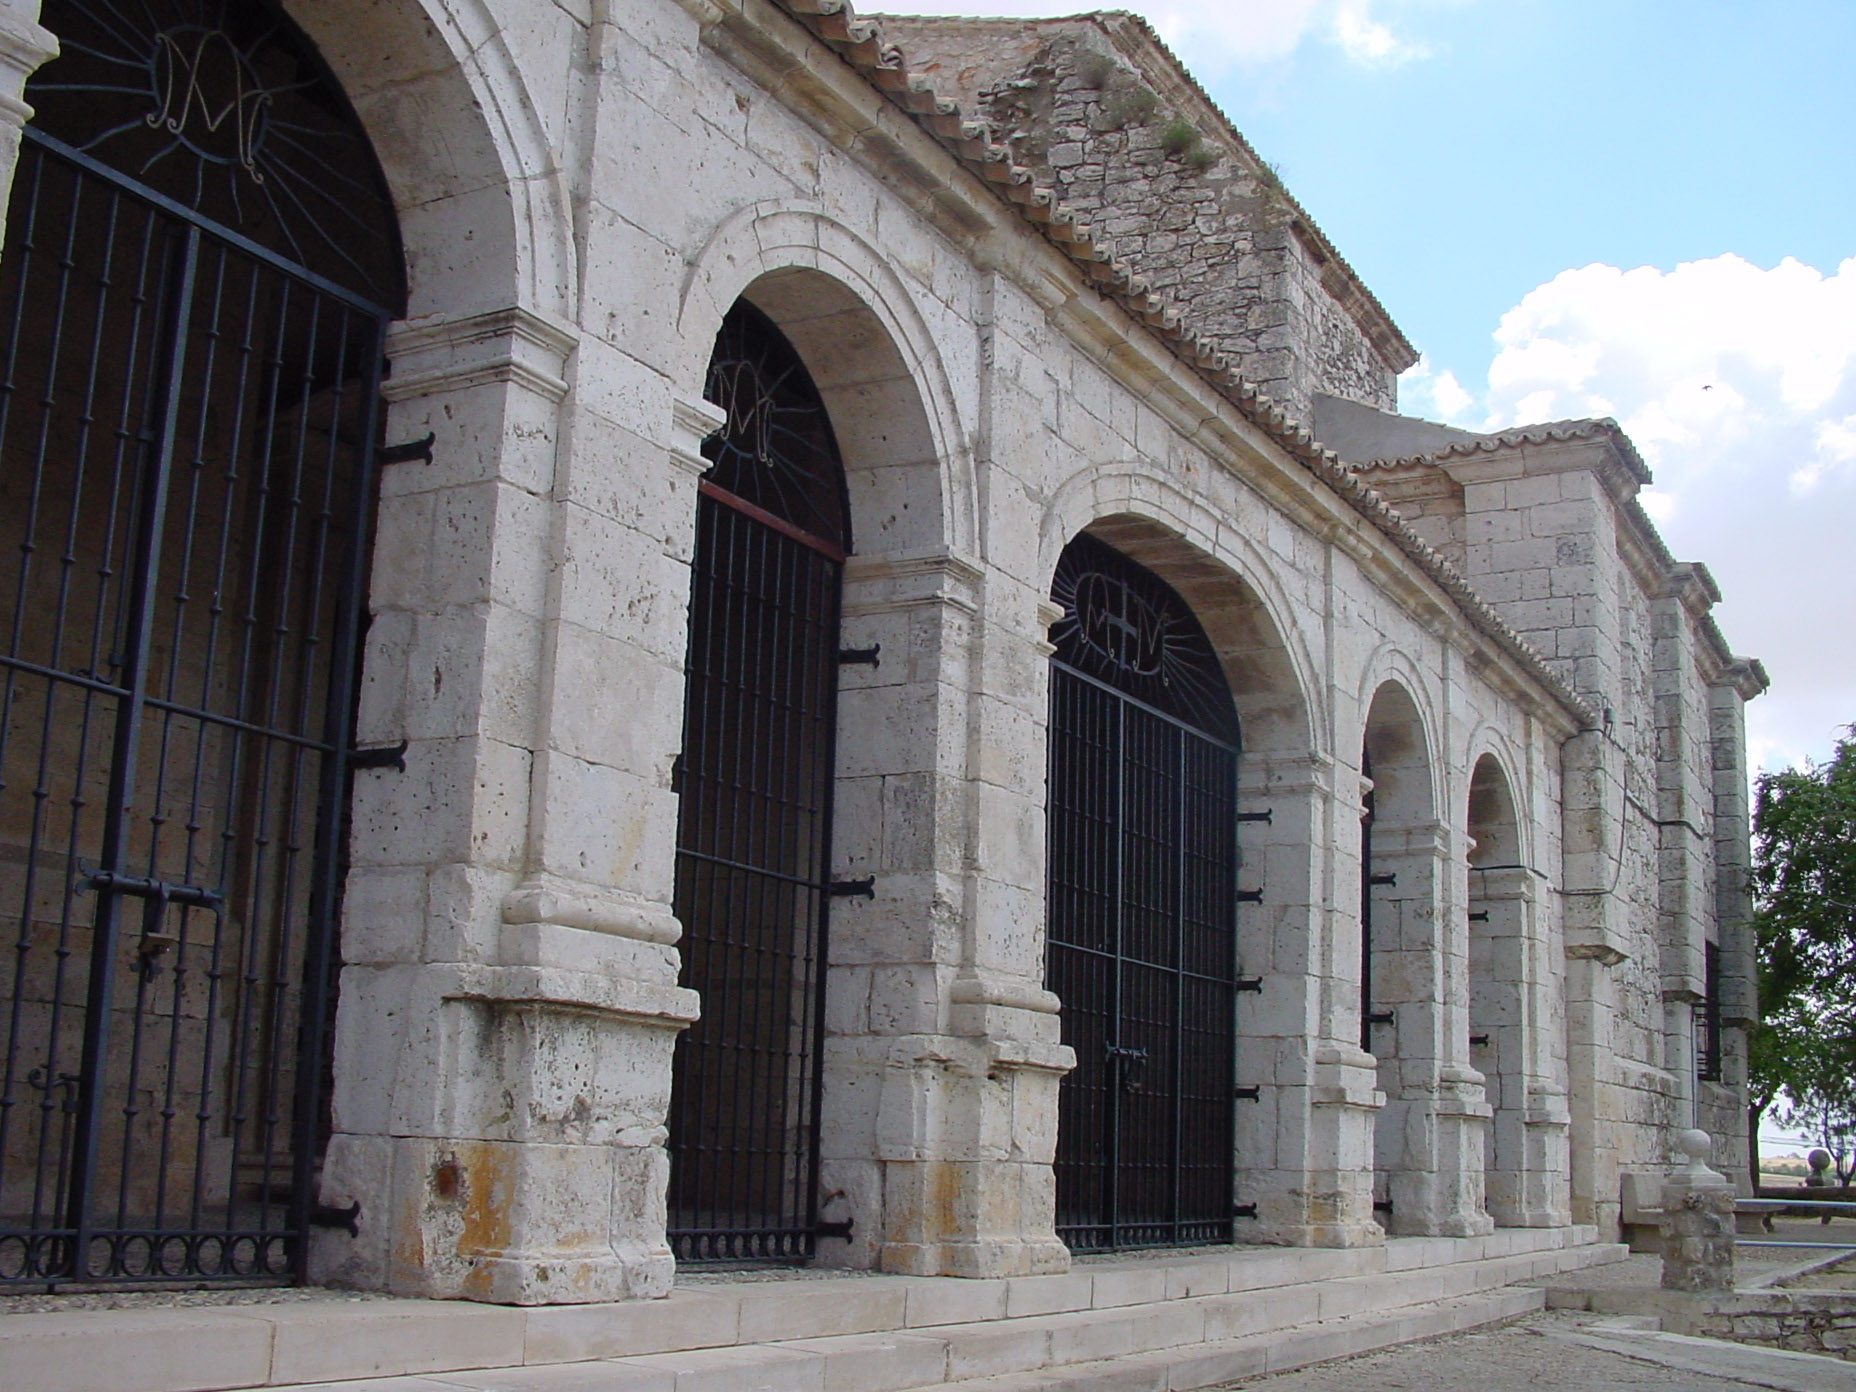 Lateral iglesia en Campo Real